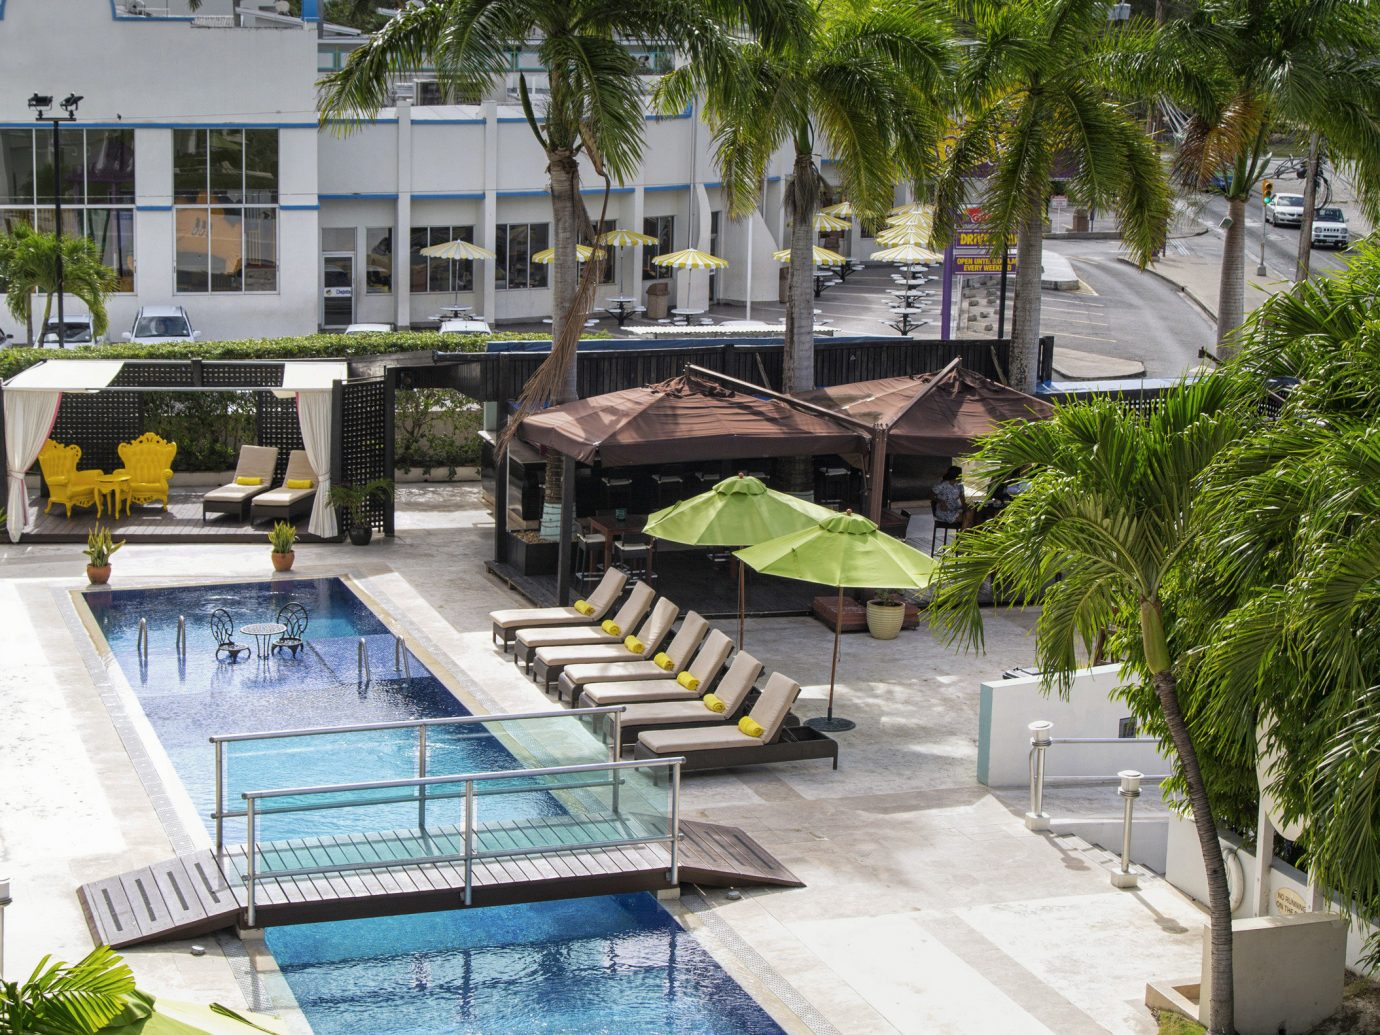 Hotels tree outdoor leisure swimming pool Resort estate vacation walkway condominium residential area waterway dock marina